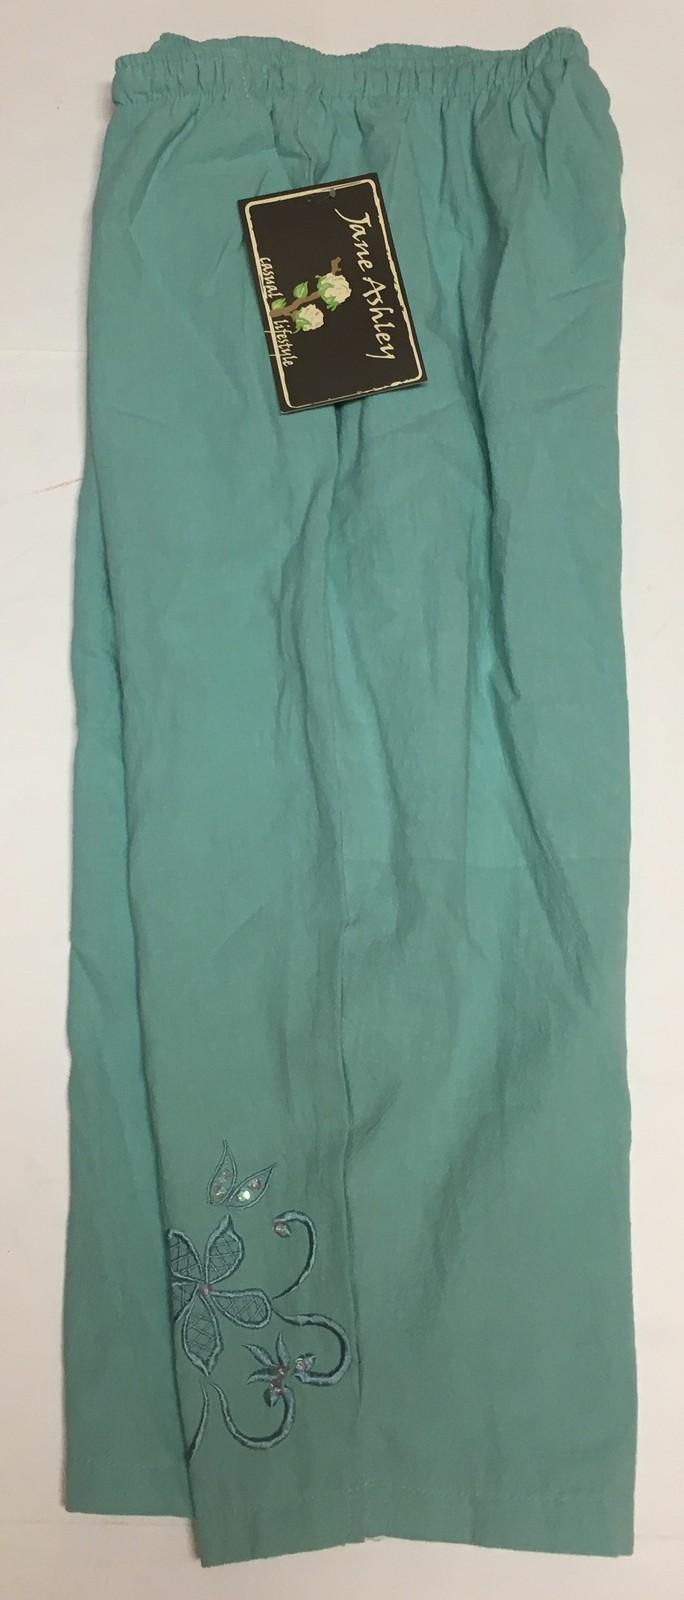 Jane Ashley Casual Lifestyle Lime Aqua Capri Pants Sz L Drawstring image 3